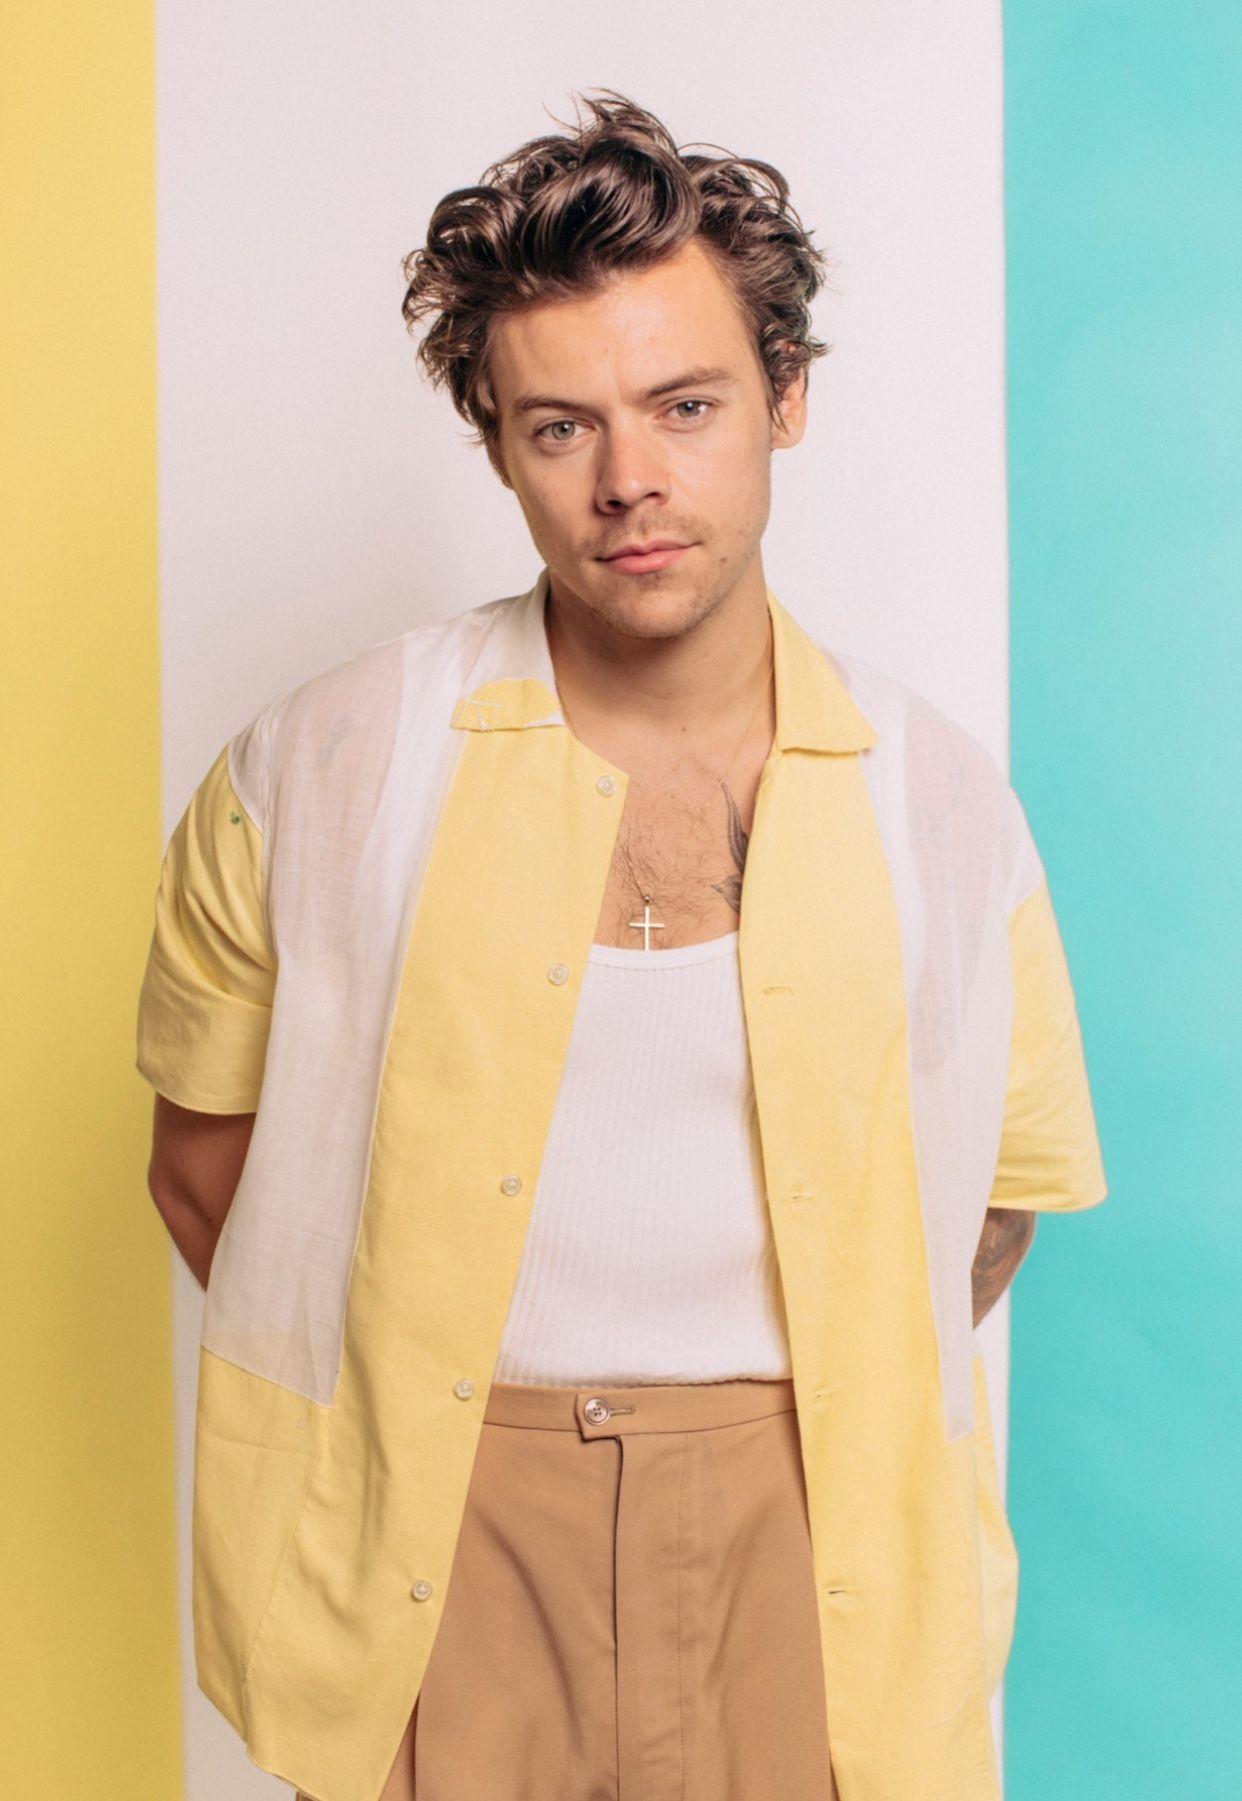 El Mas Guapo Harry Styles Fotos Harry Styles Mode Stil